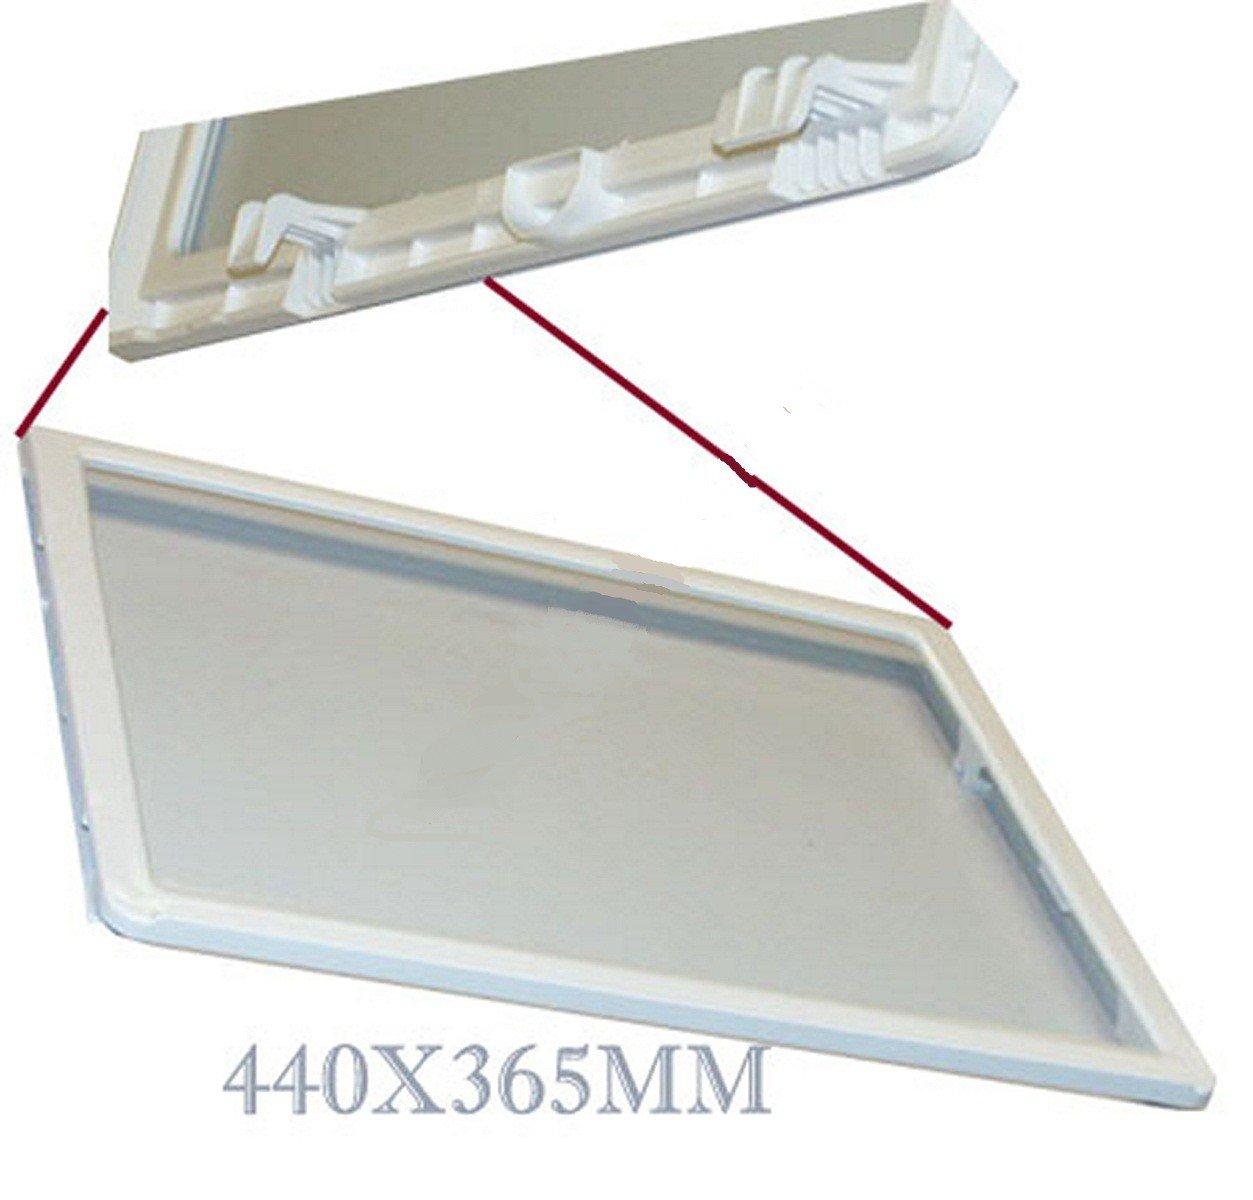 Daewoo - Clayette cristal para gcb3920acm Daewoo: Amazon.es: Hogar